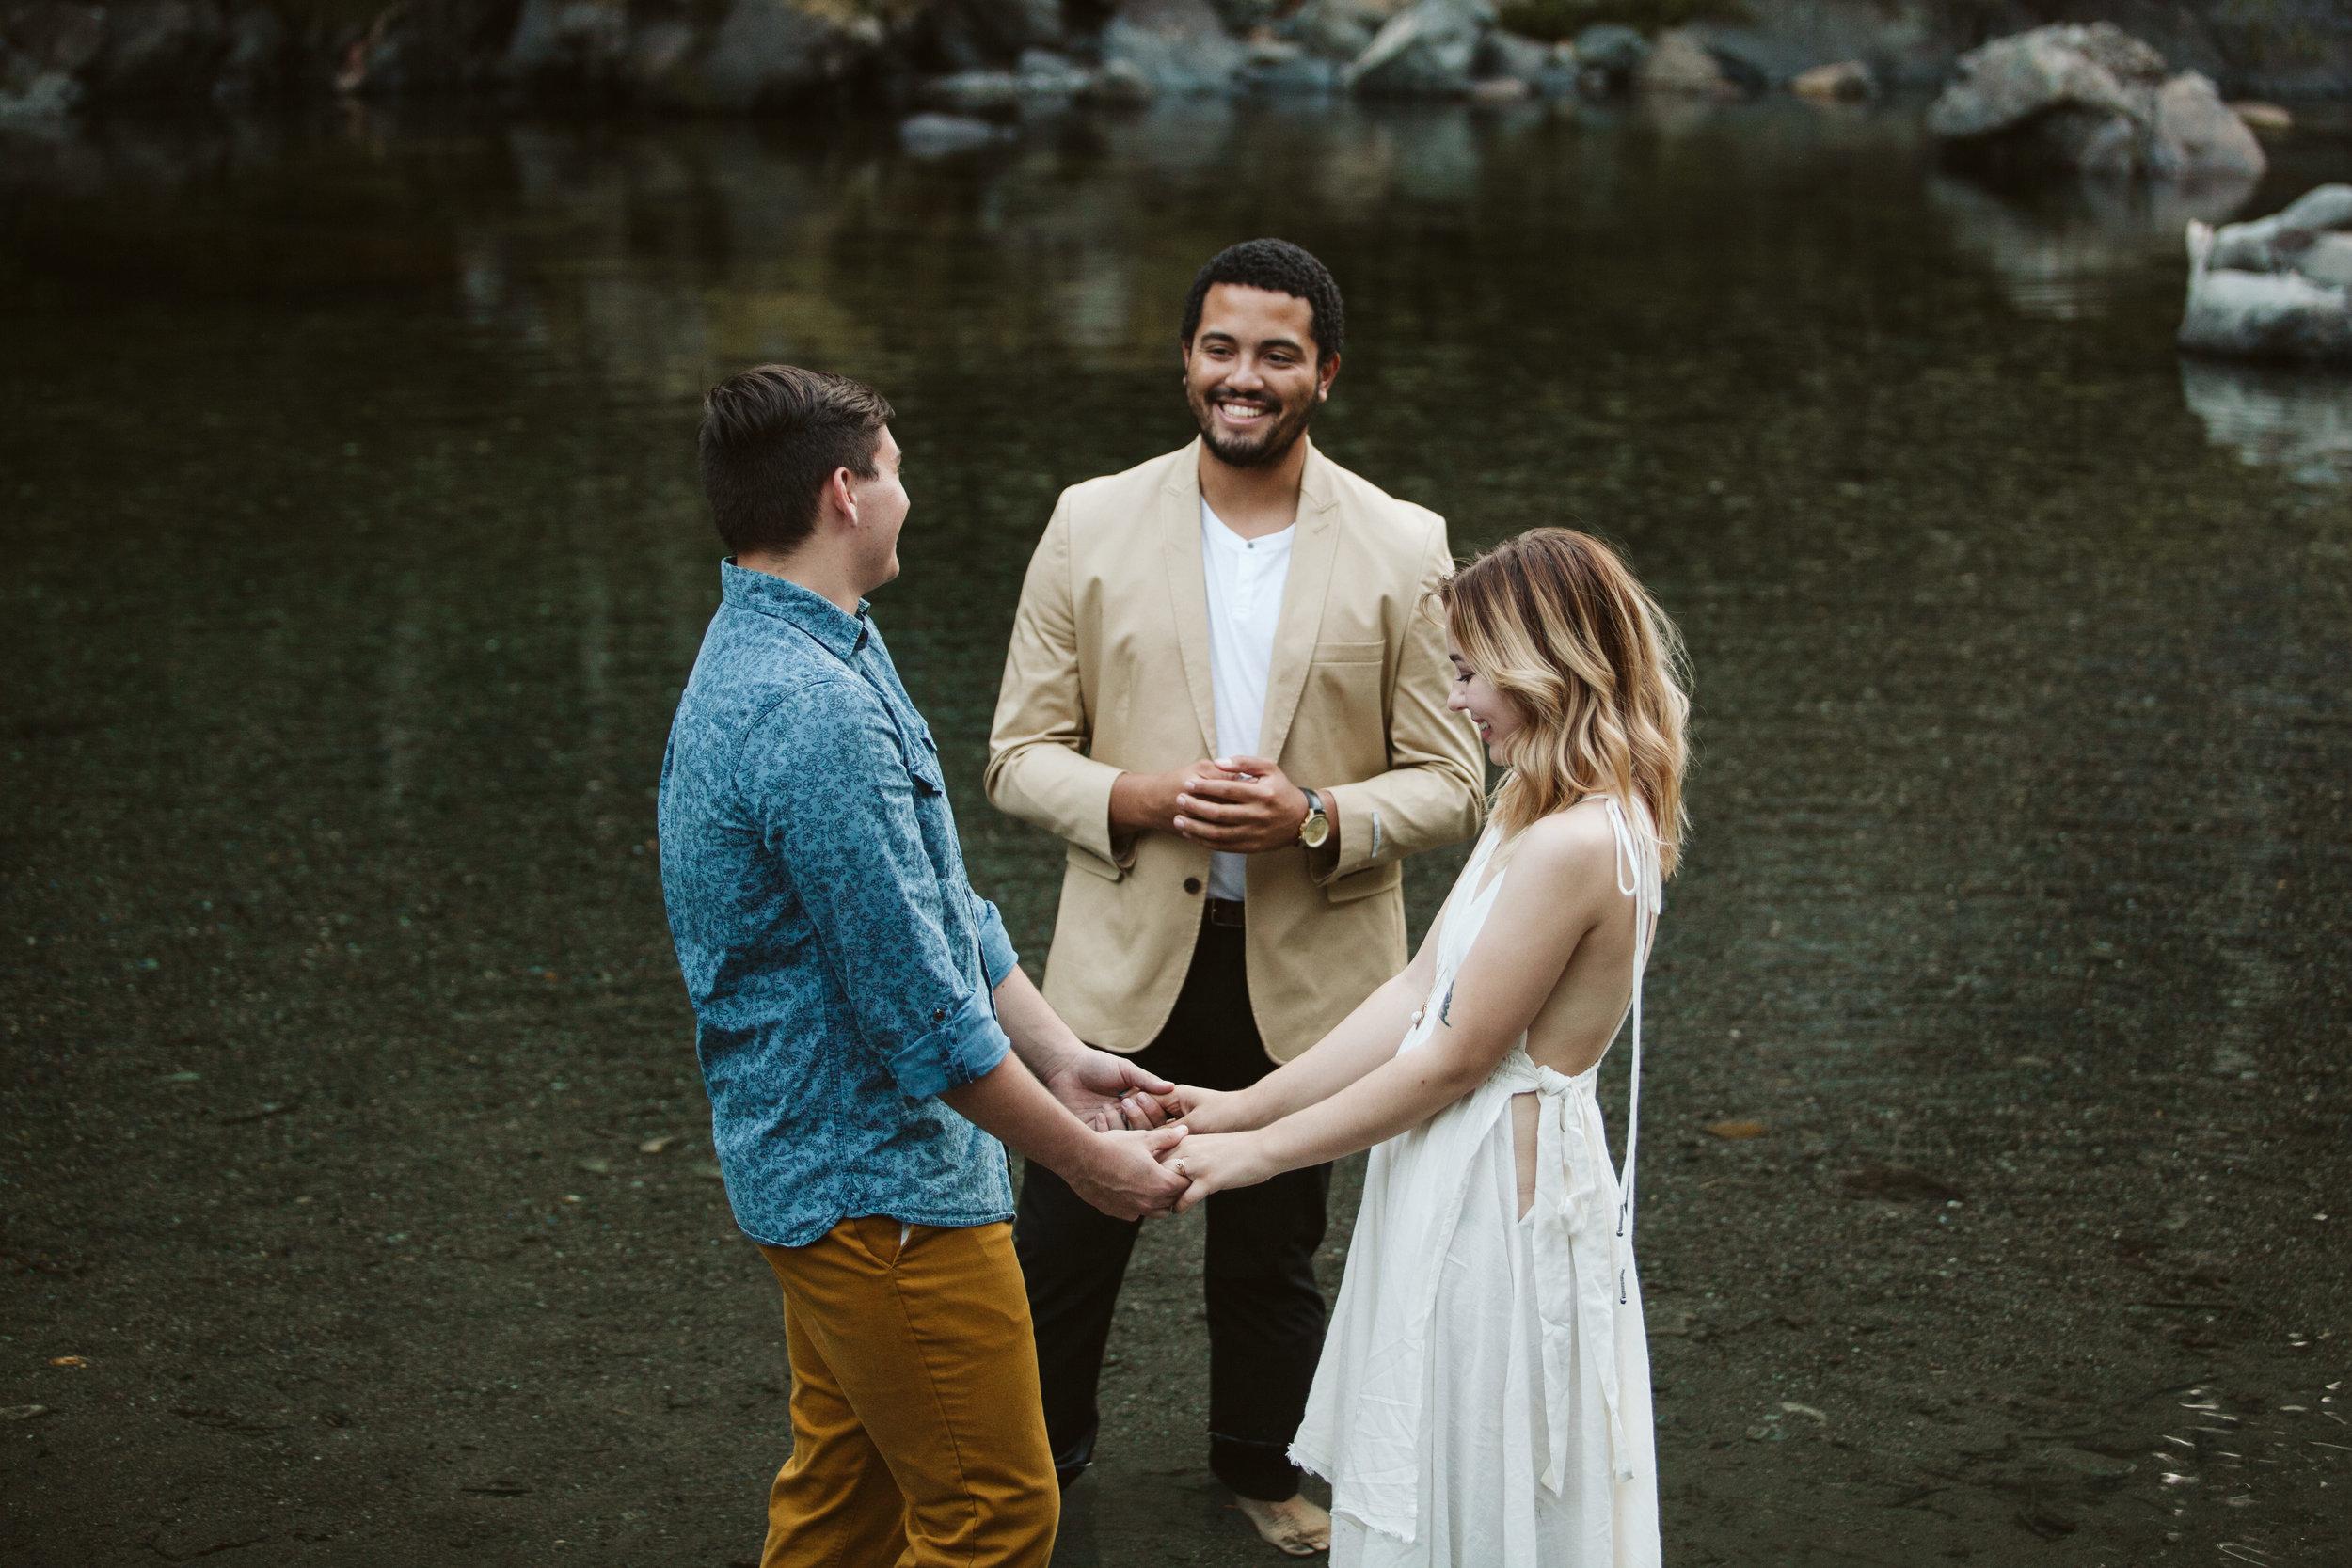 Hannah&Ben_Redwoods_Elopement_Engagement_PNW_SouthernOregon_NorthernCalifornia_ (18 of 23).jpg